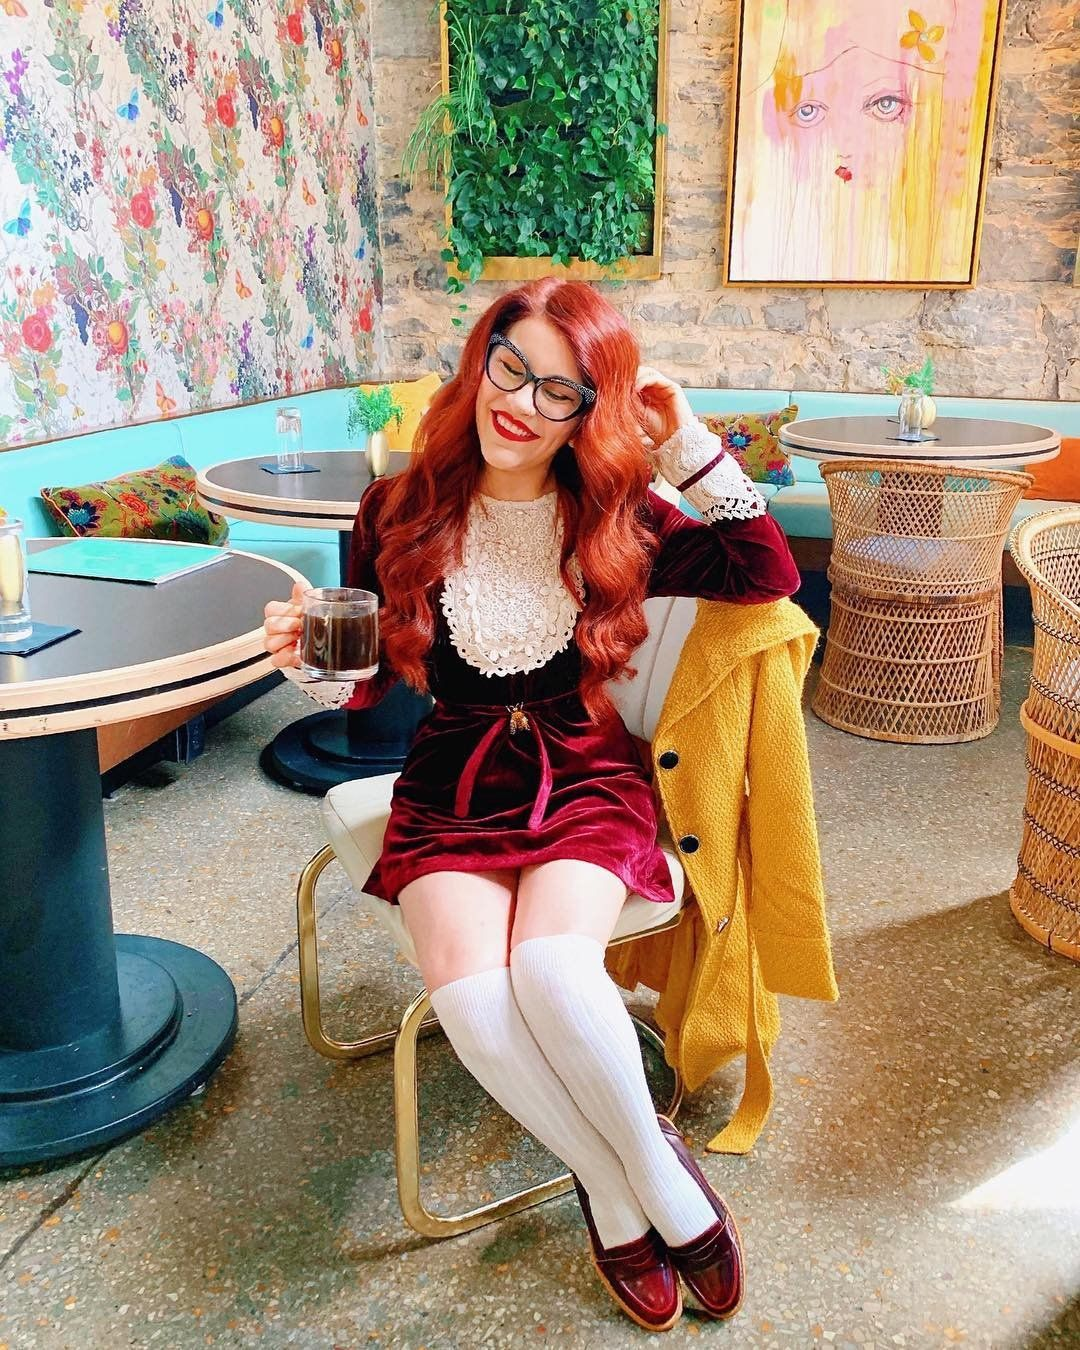 05682d986d50f ModCloth x Anna Sui X @modernjunecleaver in our Charisma Calls Velvet Dress